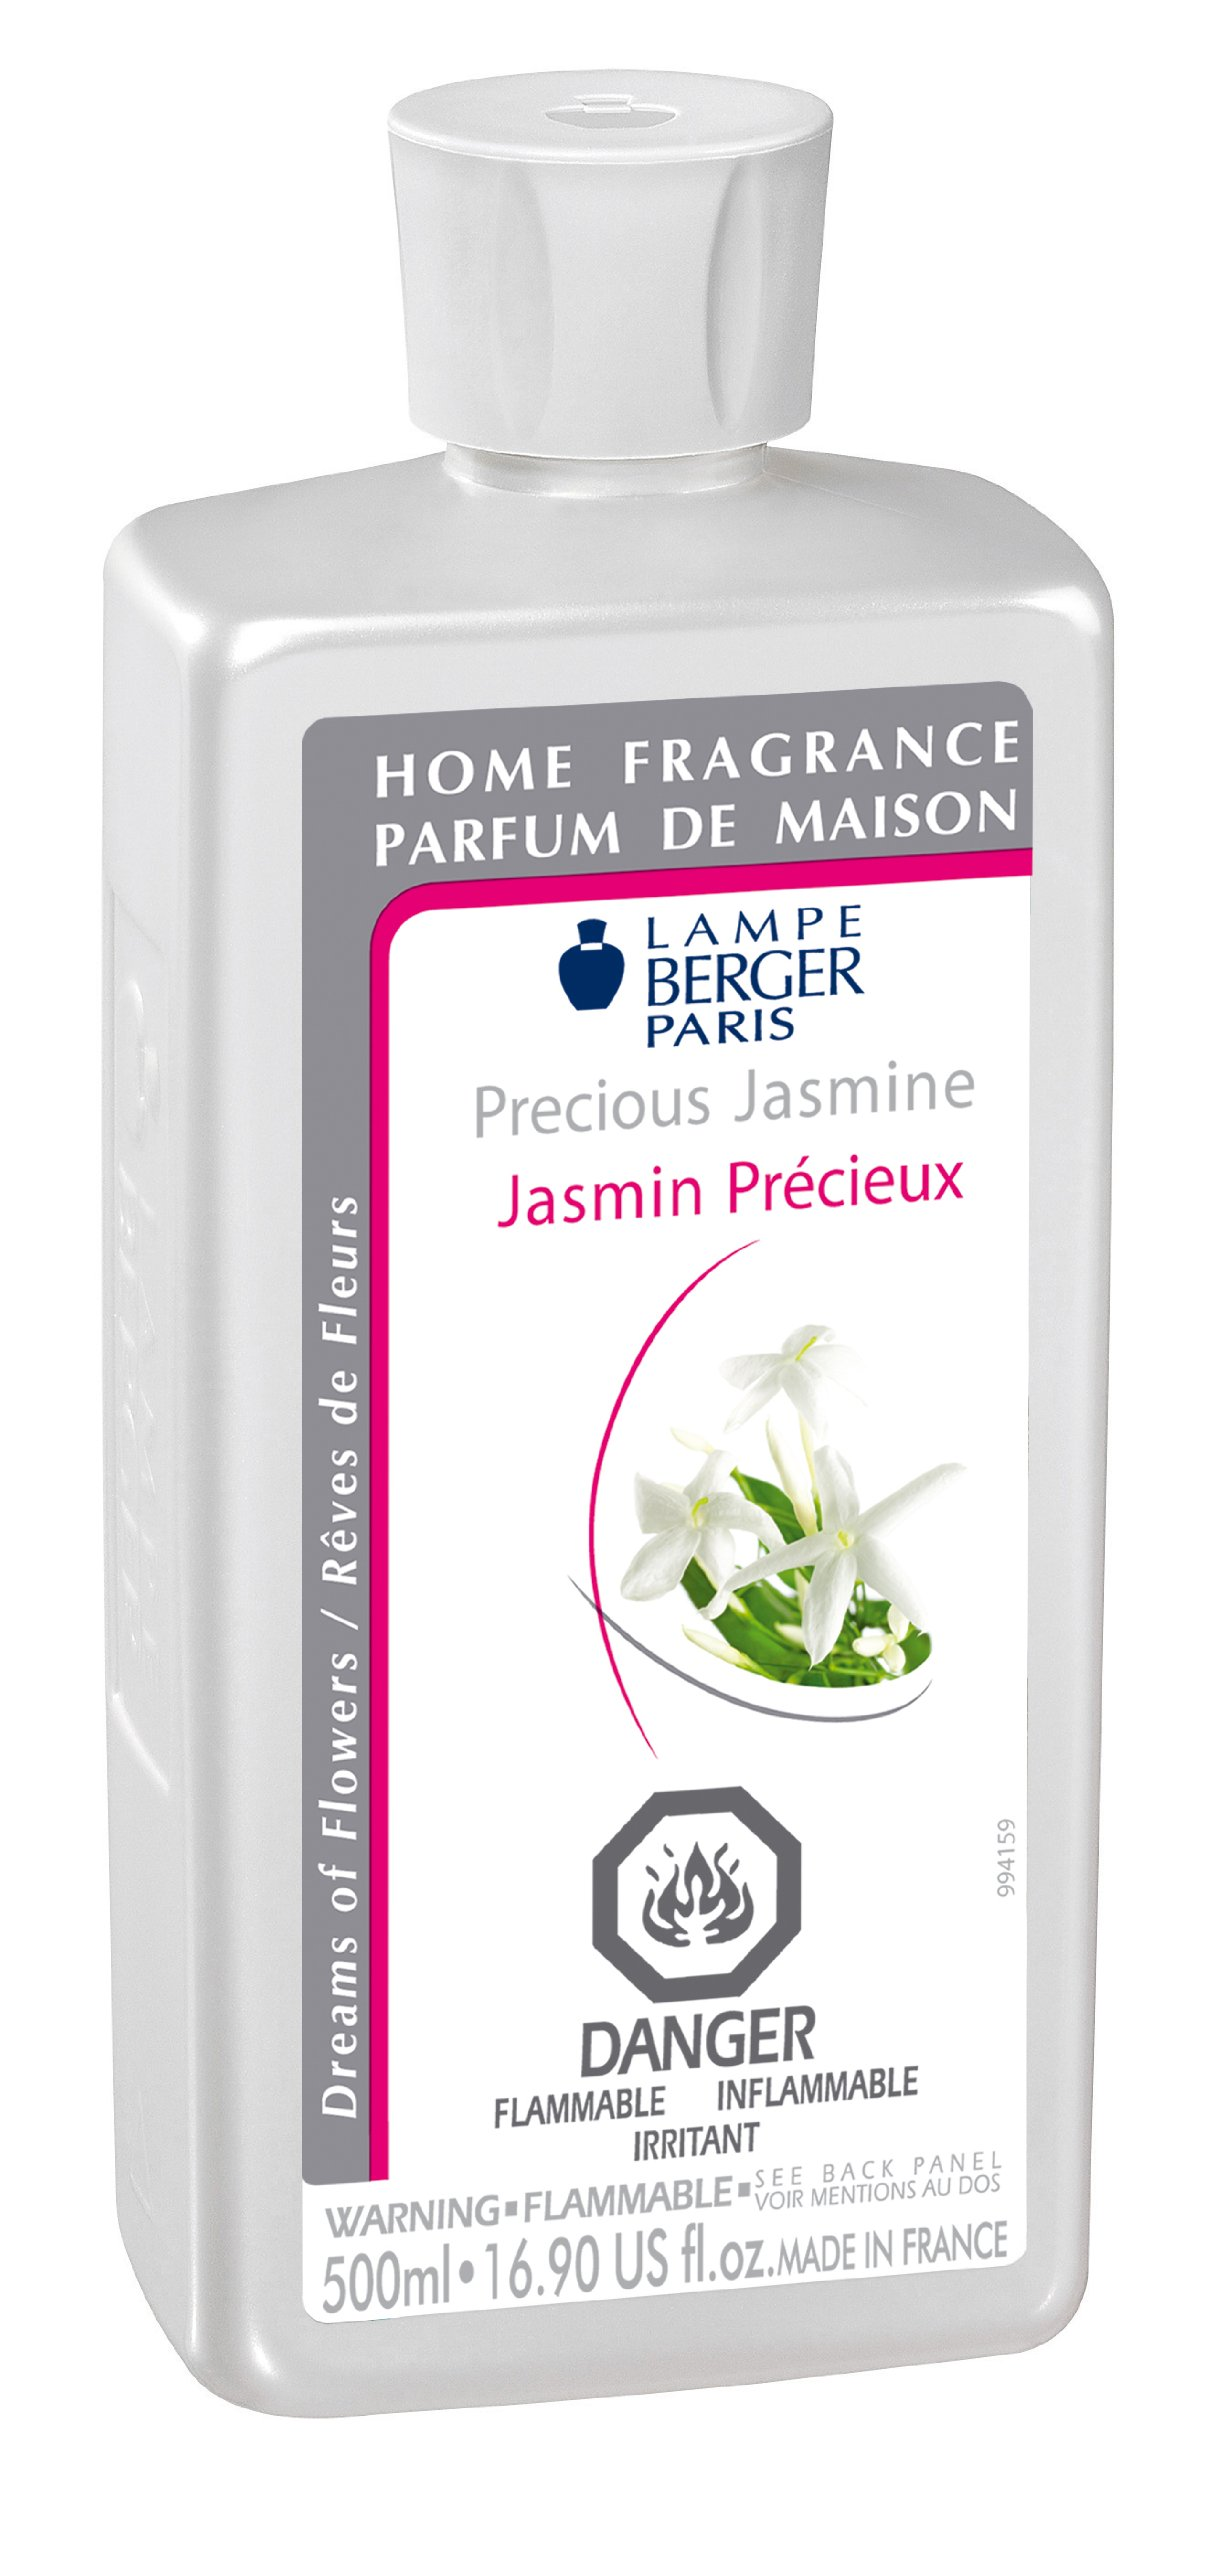 Lampe Berger Fragrance - Precious Jasmine, 500ml/16.9 fl.oz.